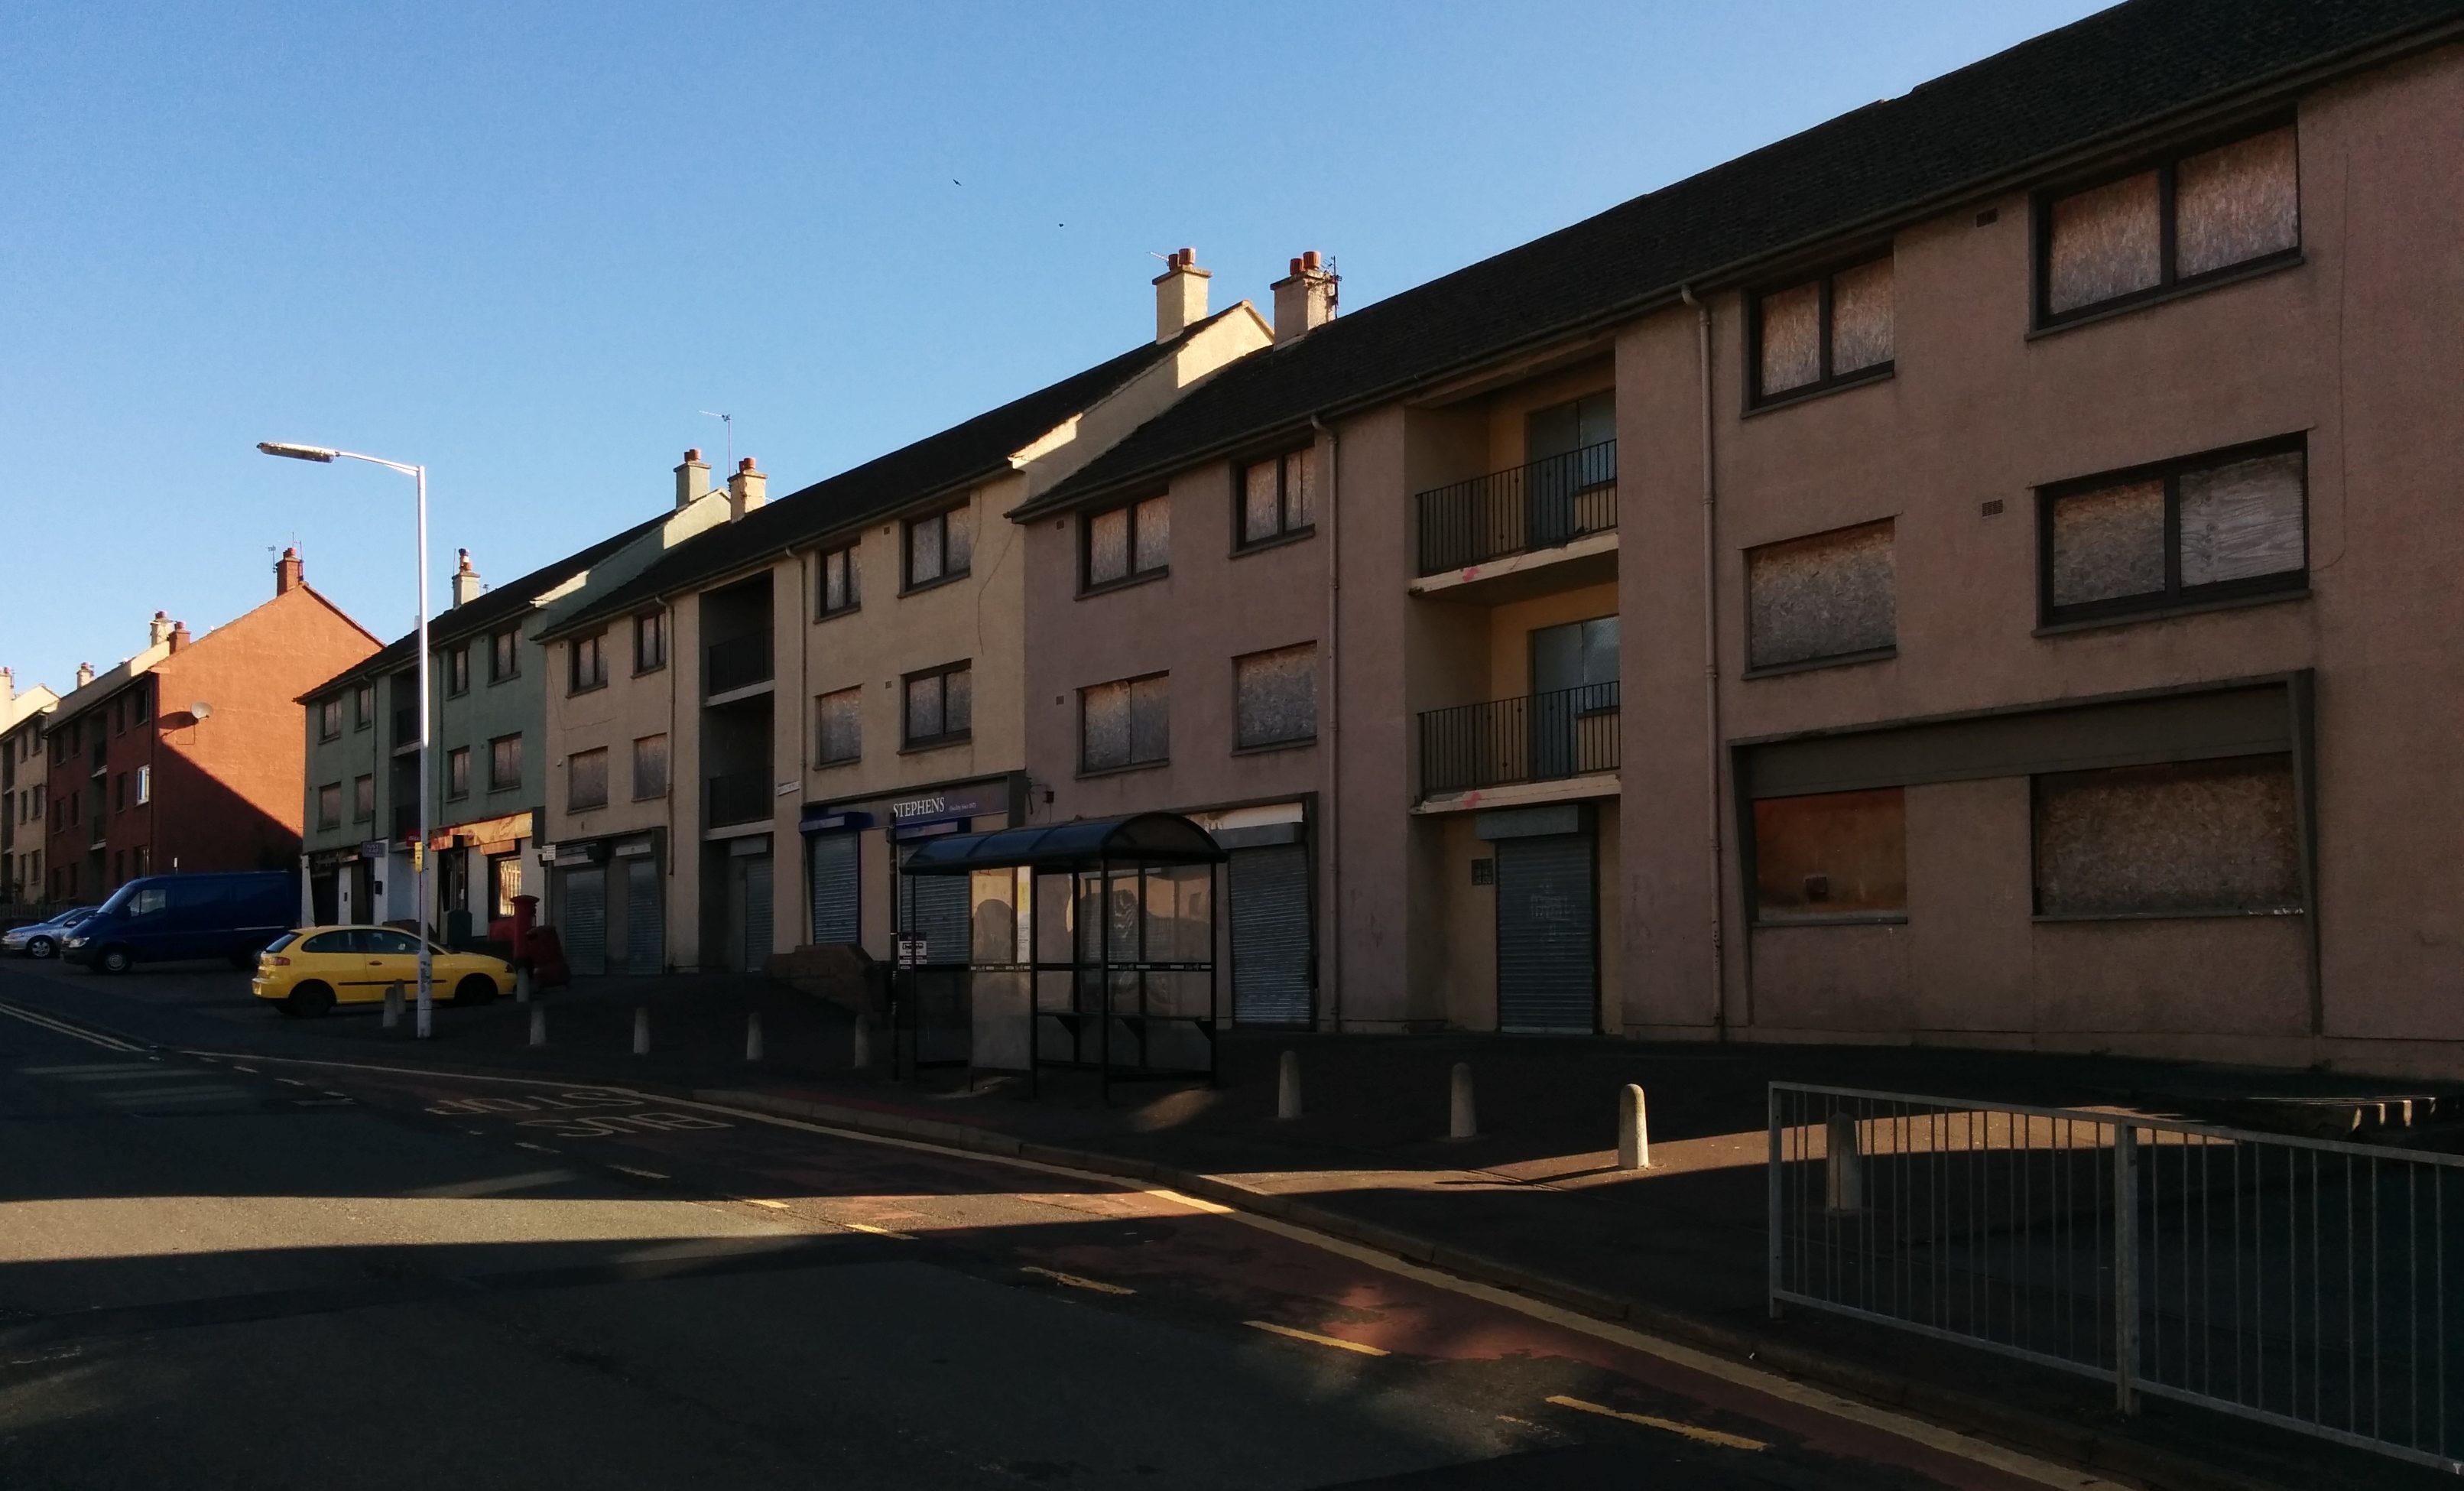 Inverkeithings Fraser Avenue, as it looks now.